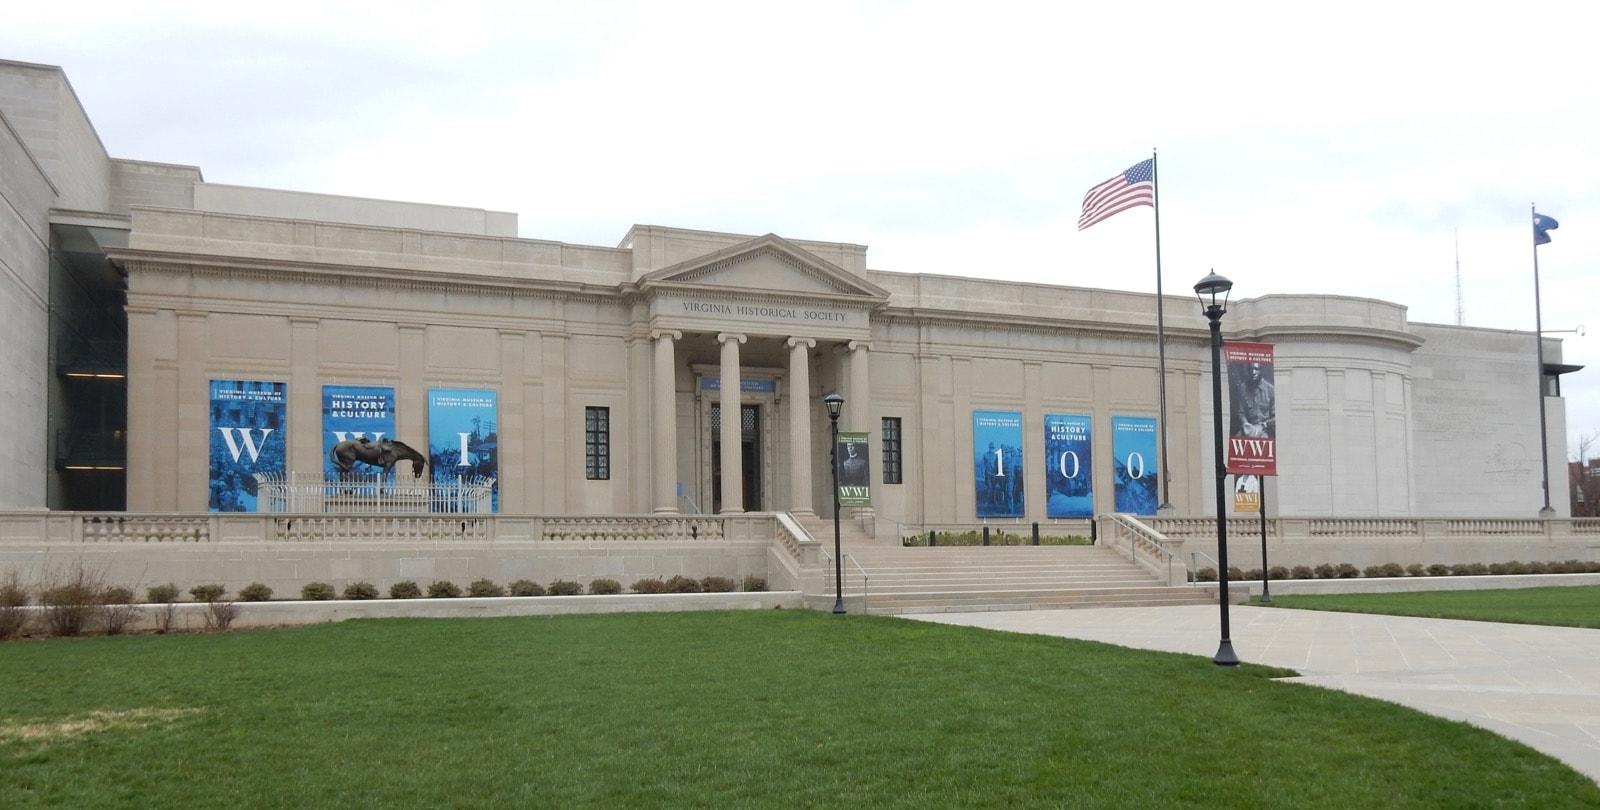 Virginia Historical Society Richmond VA